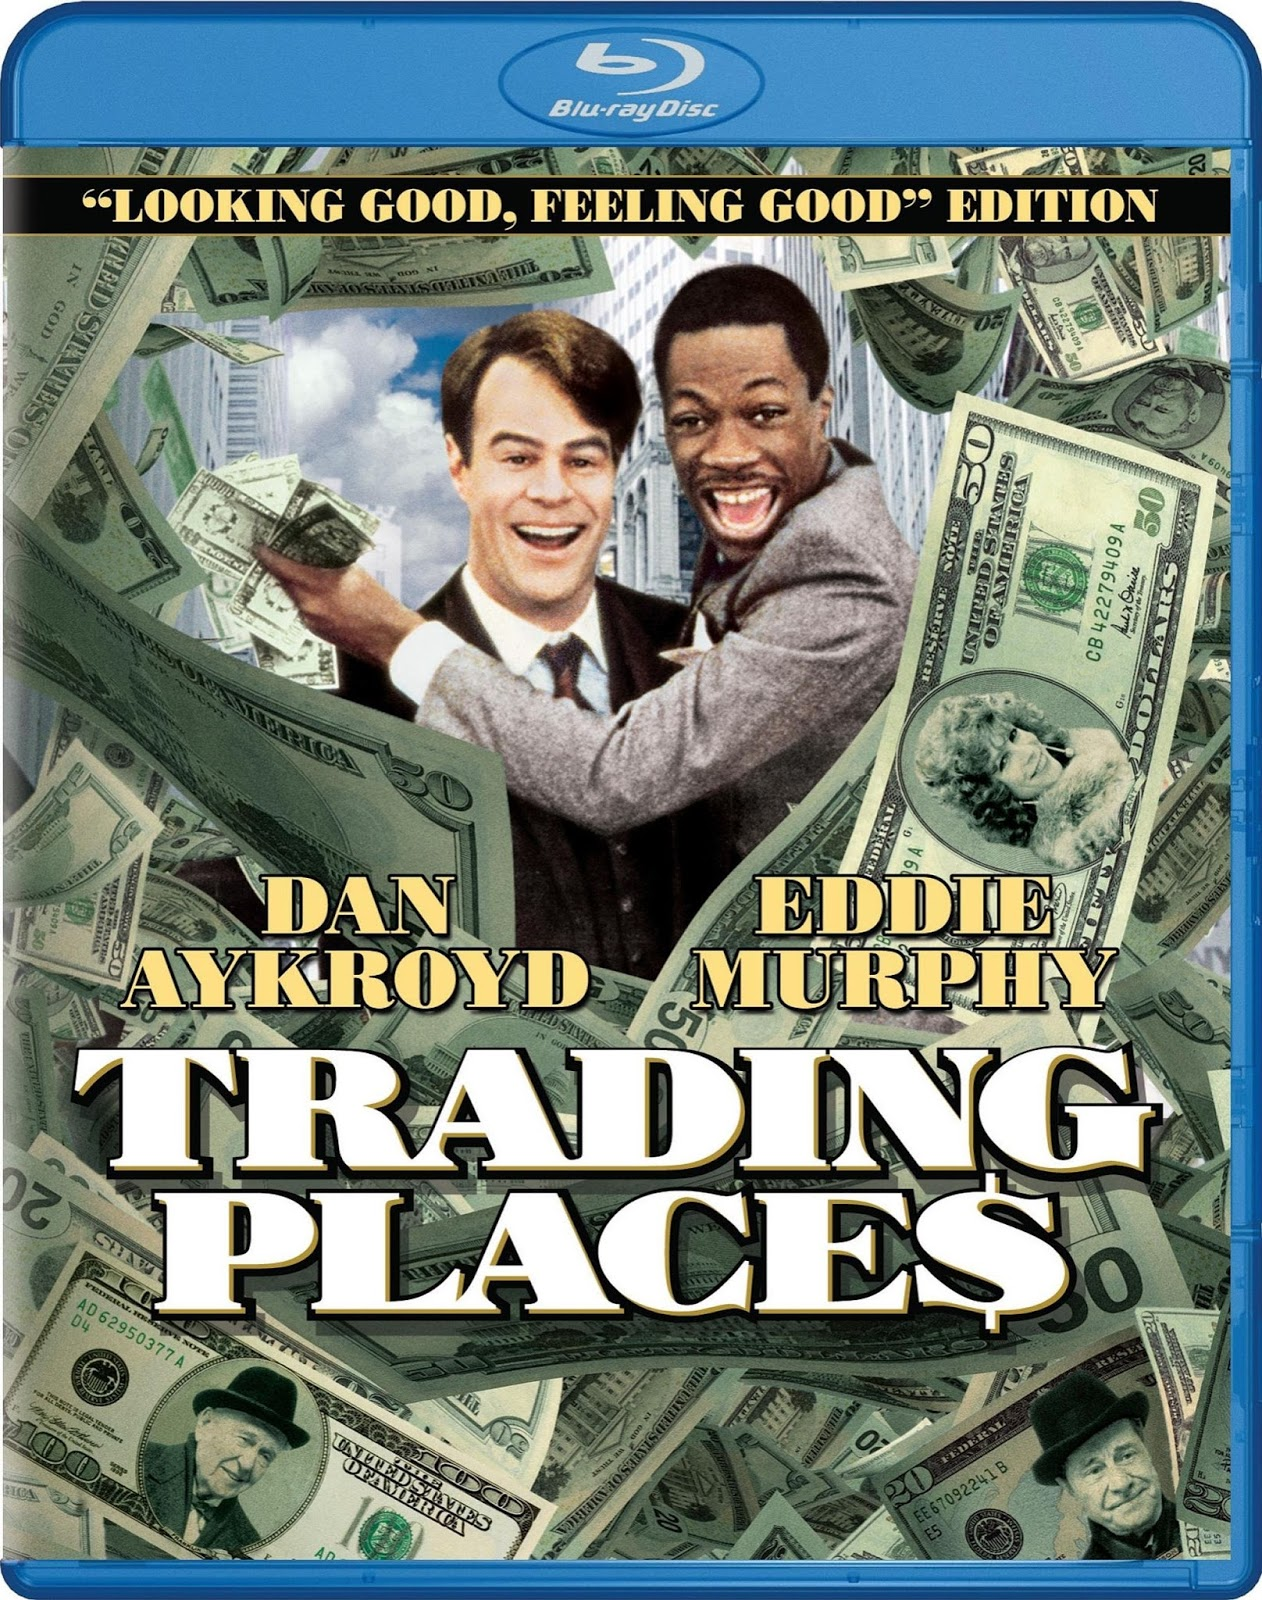 Trading Places (1983) ταινιες online seires oipeirates greek subs